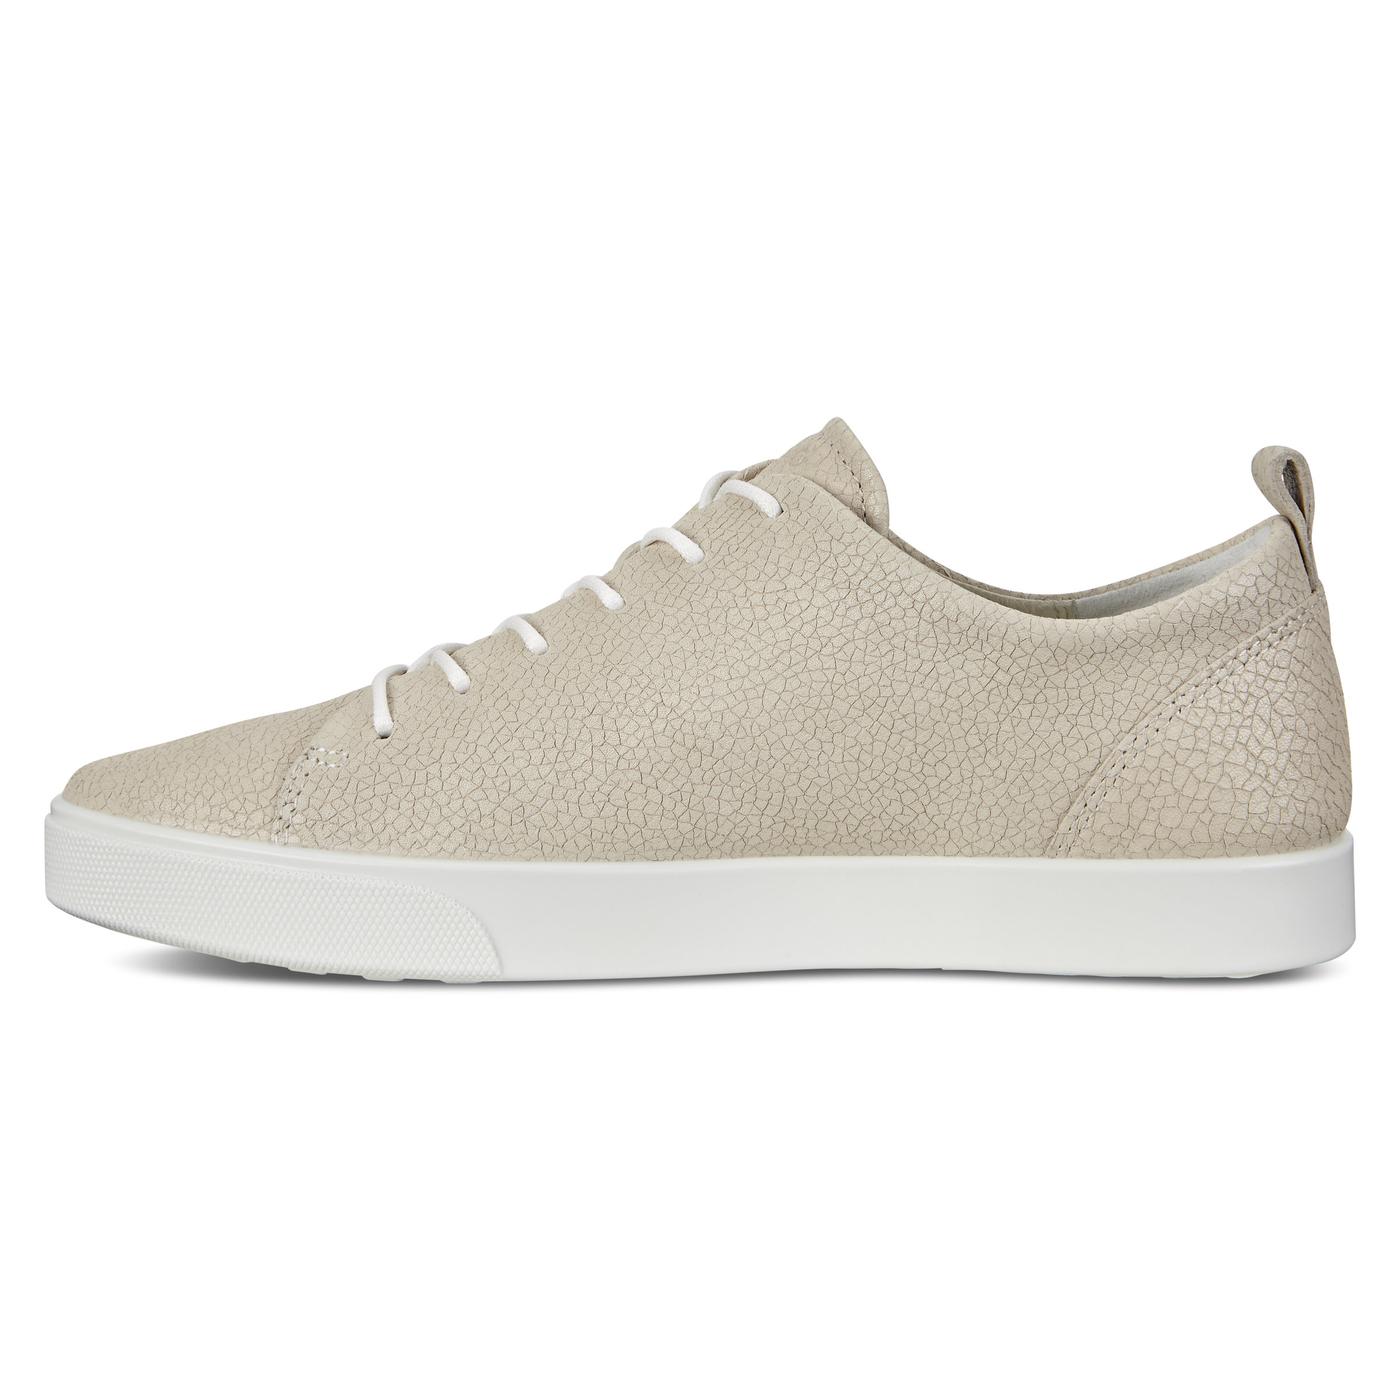 ECCO GILLIAN Cracked-Leather Sneaker Tie